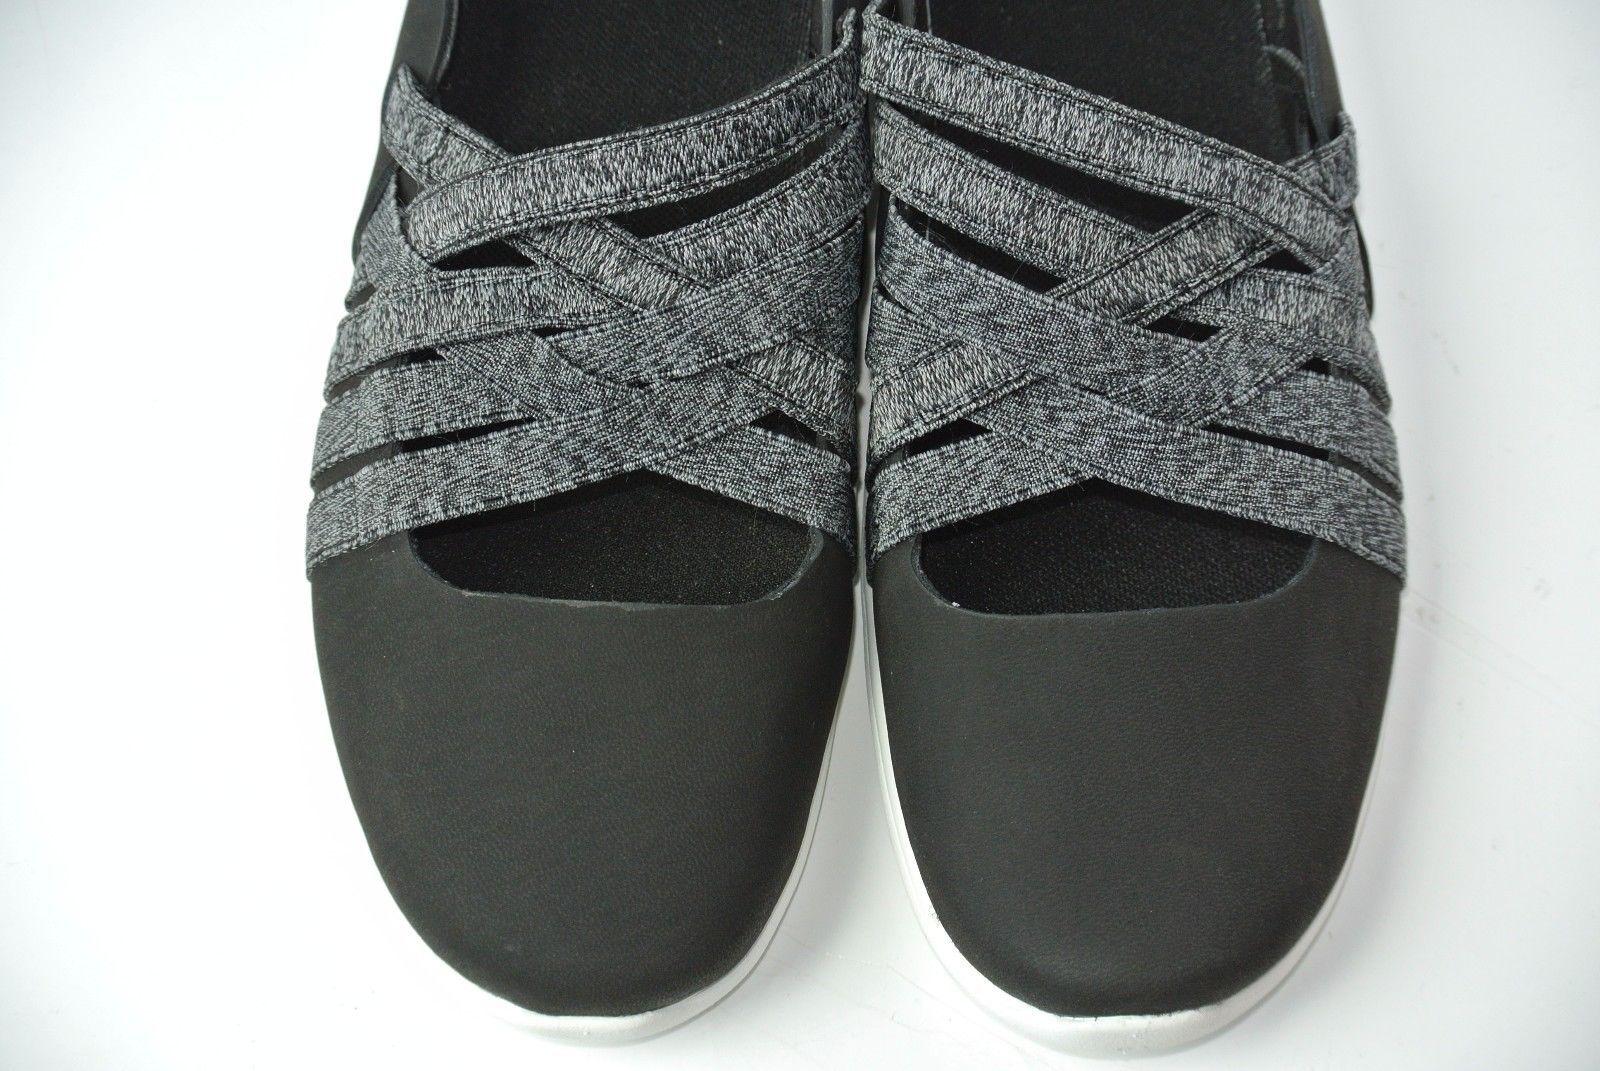 NEW Merrell Flora Kye Womens Sz 6.5 Black Weave Slip-on Ballet Sneakers Shoes